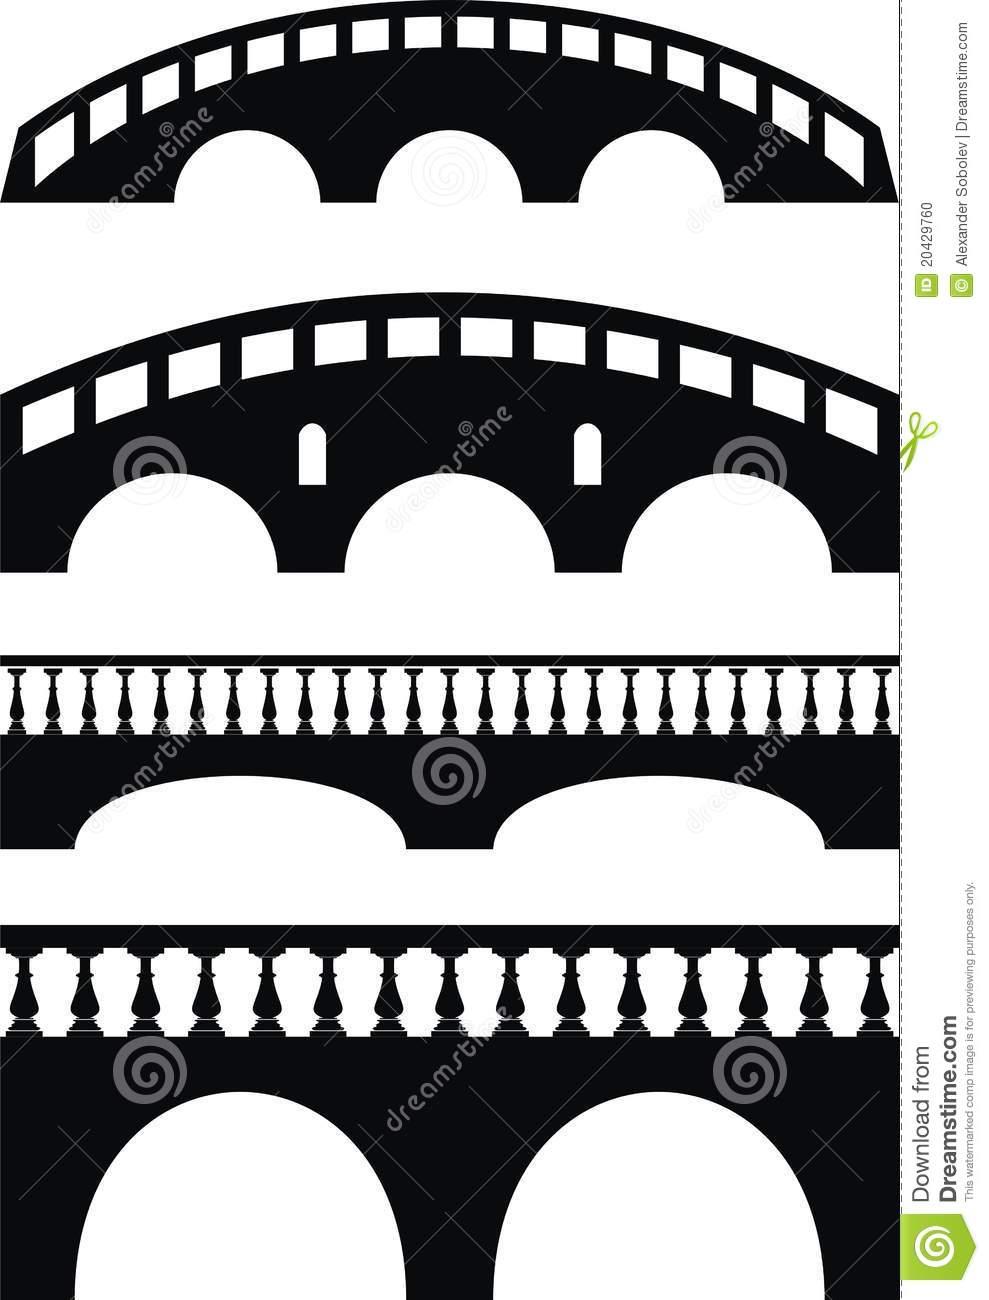 Stone Ancient Bridge, Balustrade Stock Photo.